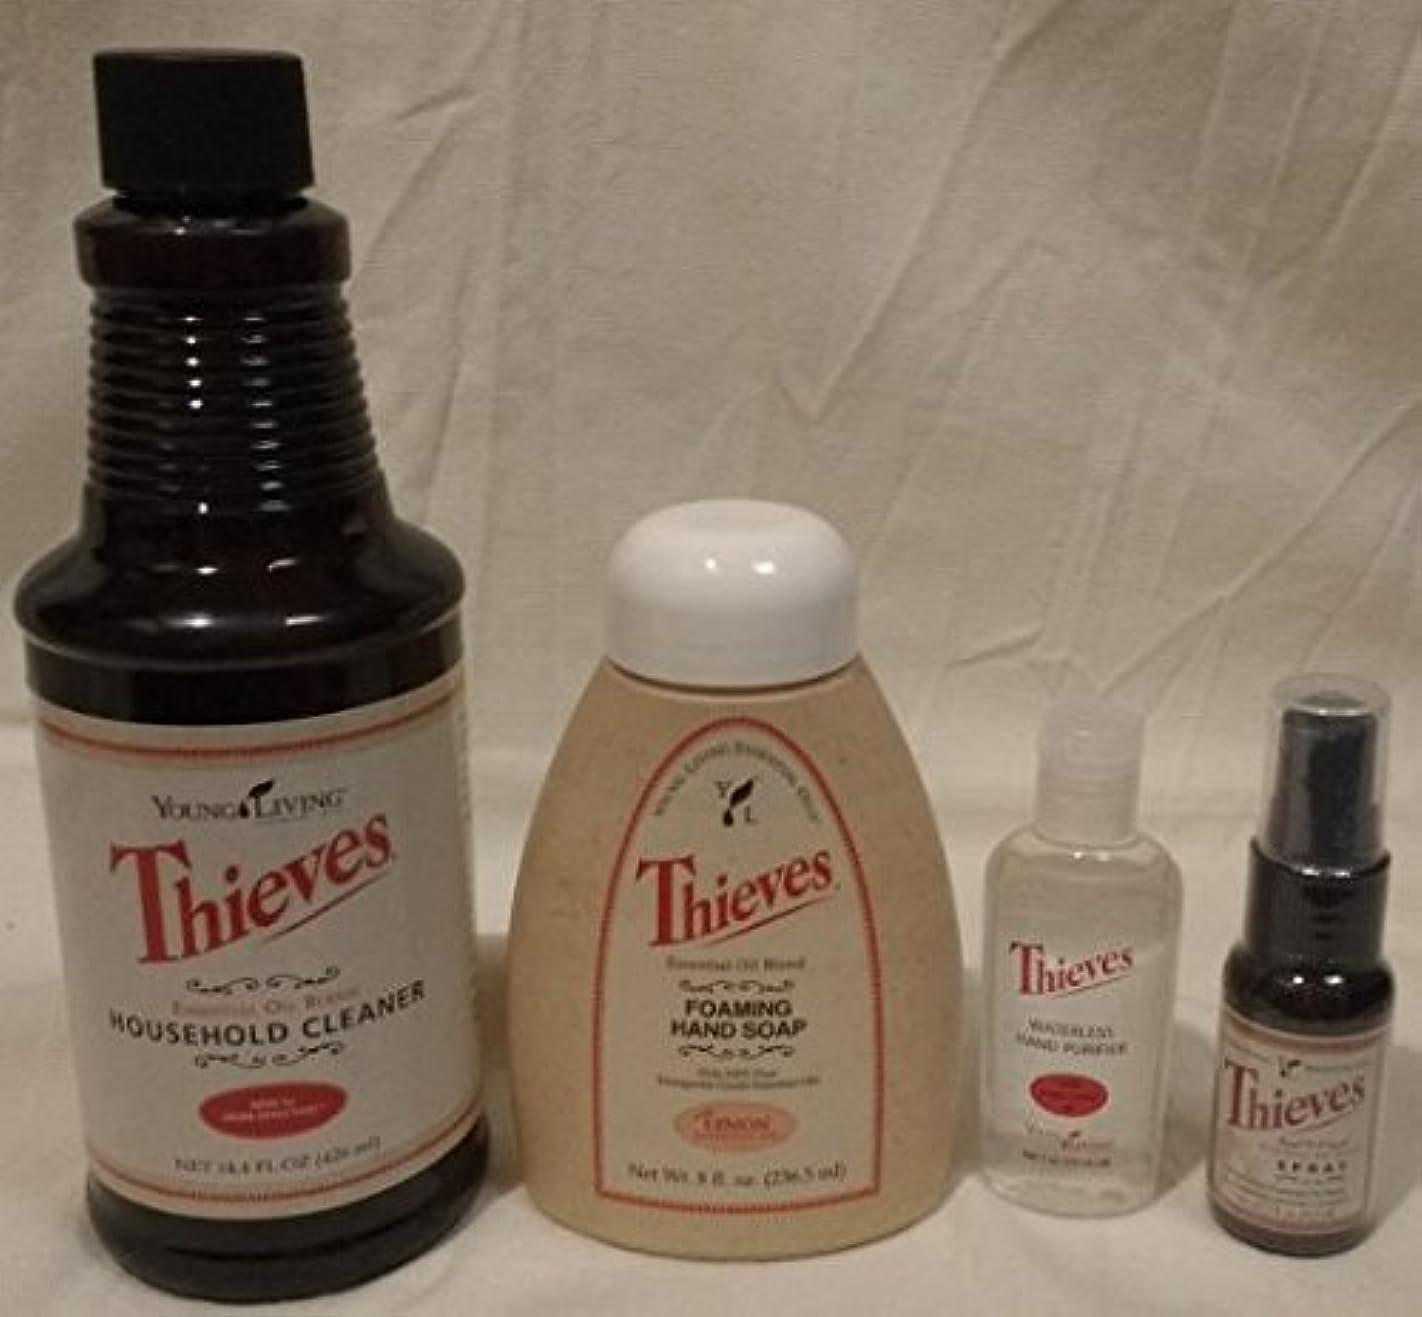 Thieves Healthy Home Kit Plus Thieves Essential Oil d88895176469